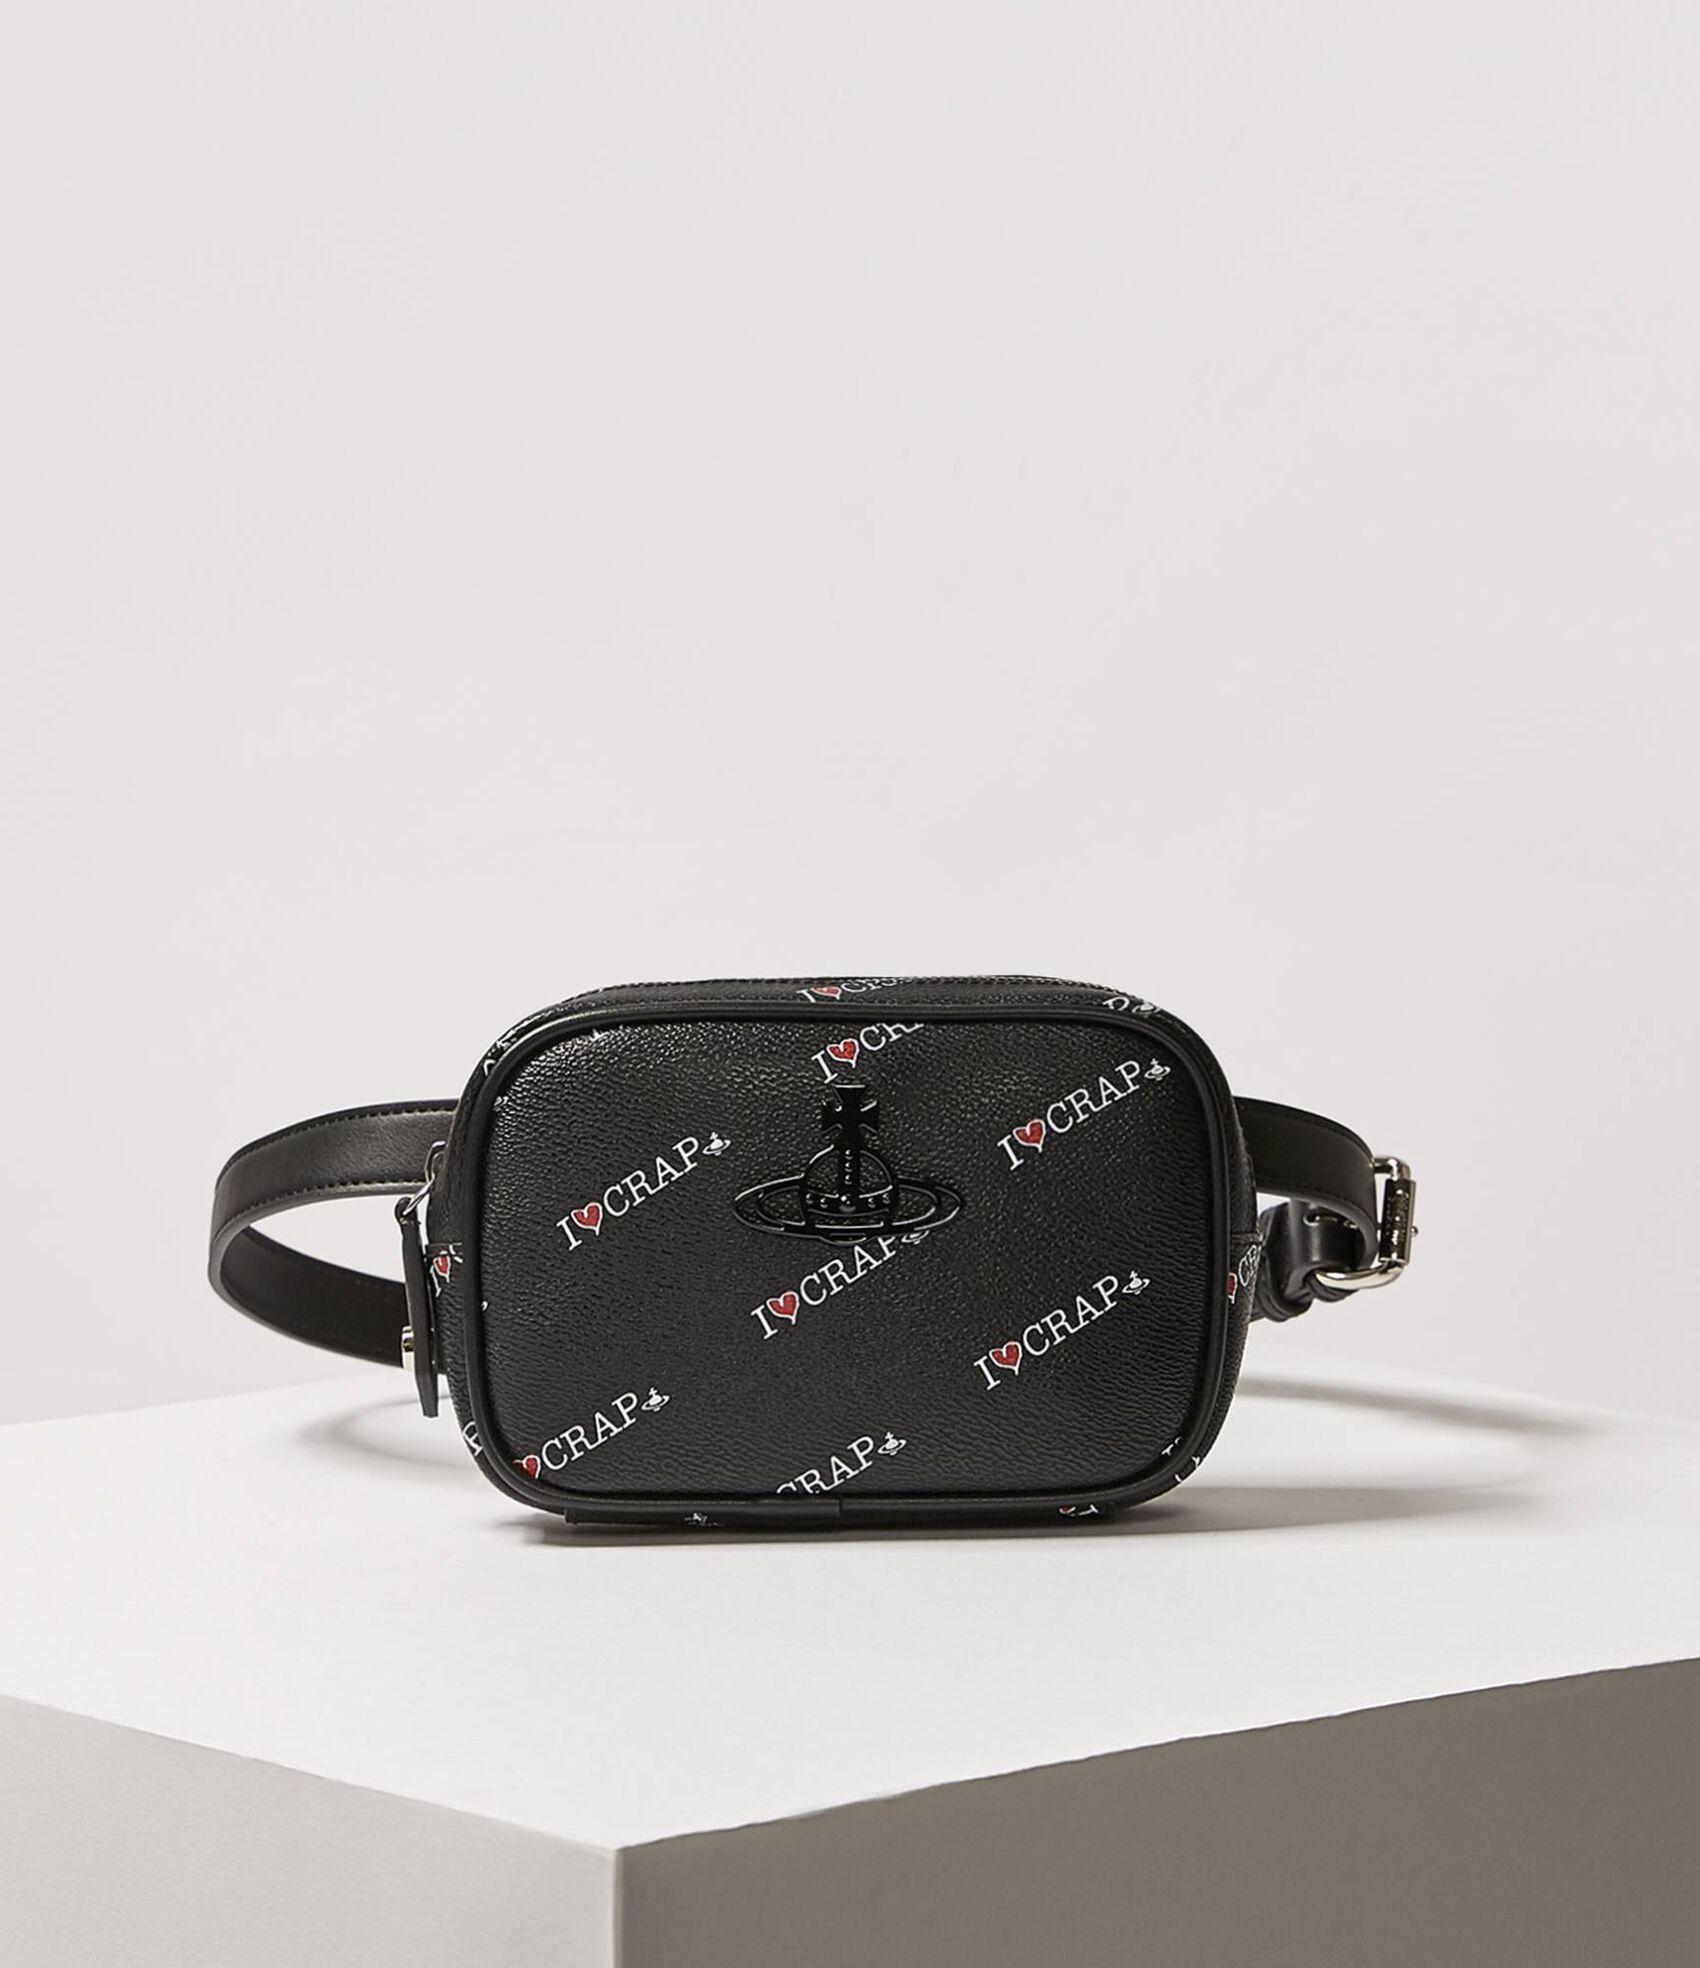 0a3ae71598d Vivienne Westwood Women's Designer Crossbody Bags | Women's CrossBody Bags  | Vivienne Westwood - Annie Belt Bag Black